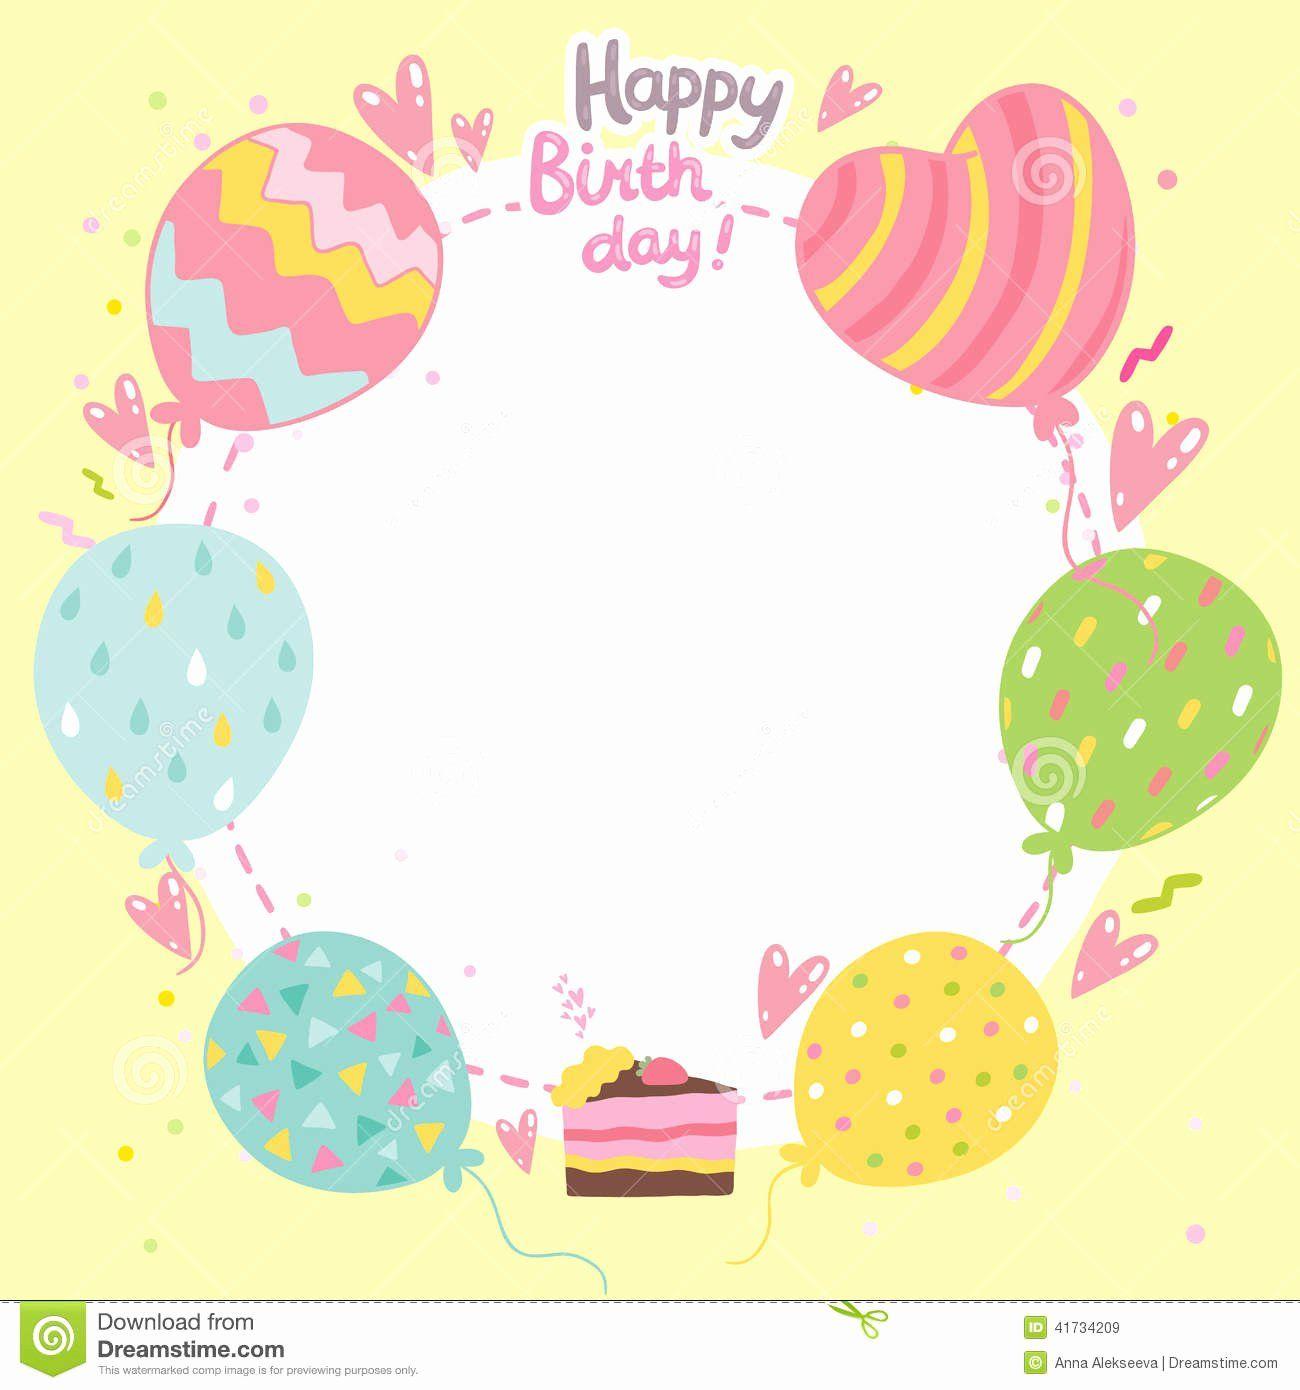 Free Birthday Card Templates New Birthday Card Template Free Birthday Card Happy Birthday Template Birthday Card Printable